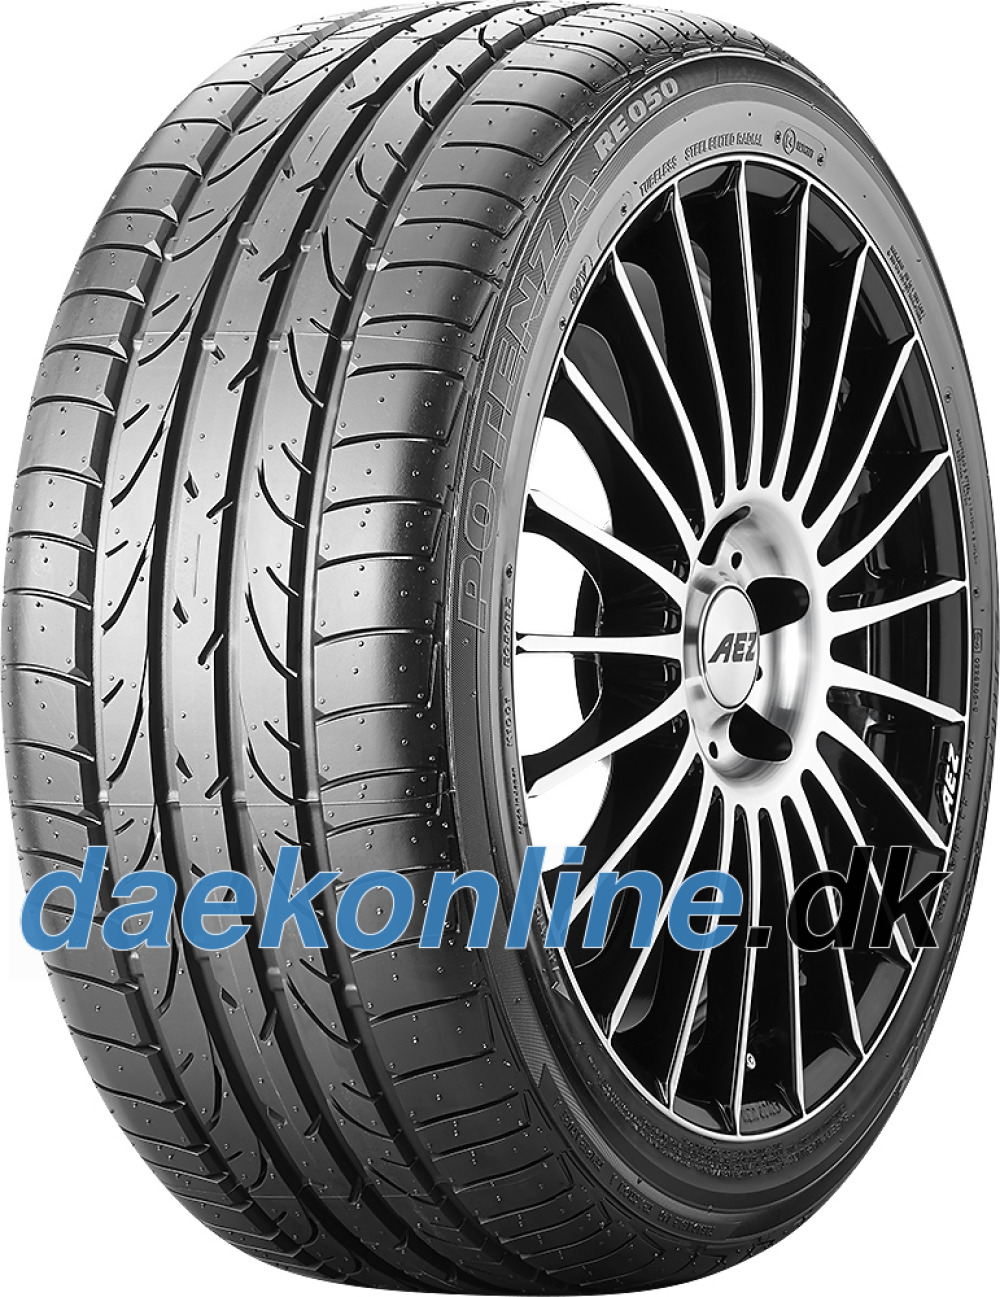 bridgestone-potenza-re-050-rft-24545-r17-95y-runflat-med-falgbeskyttelse-mfs